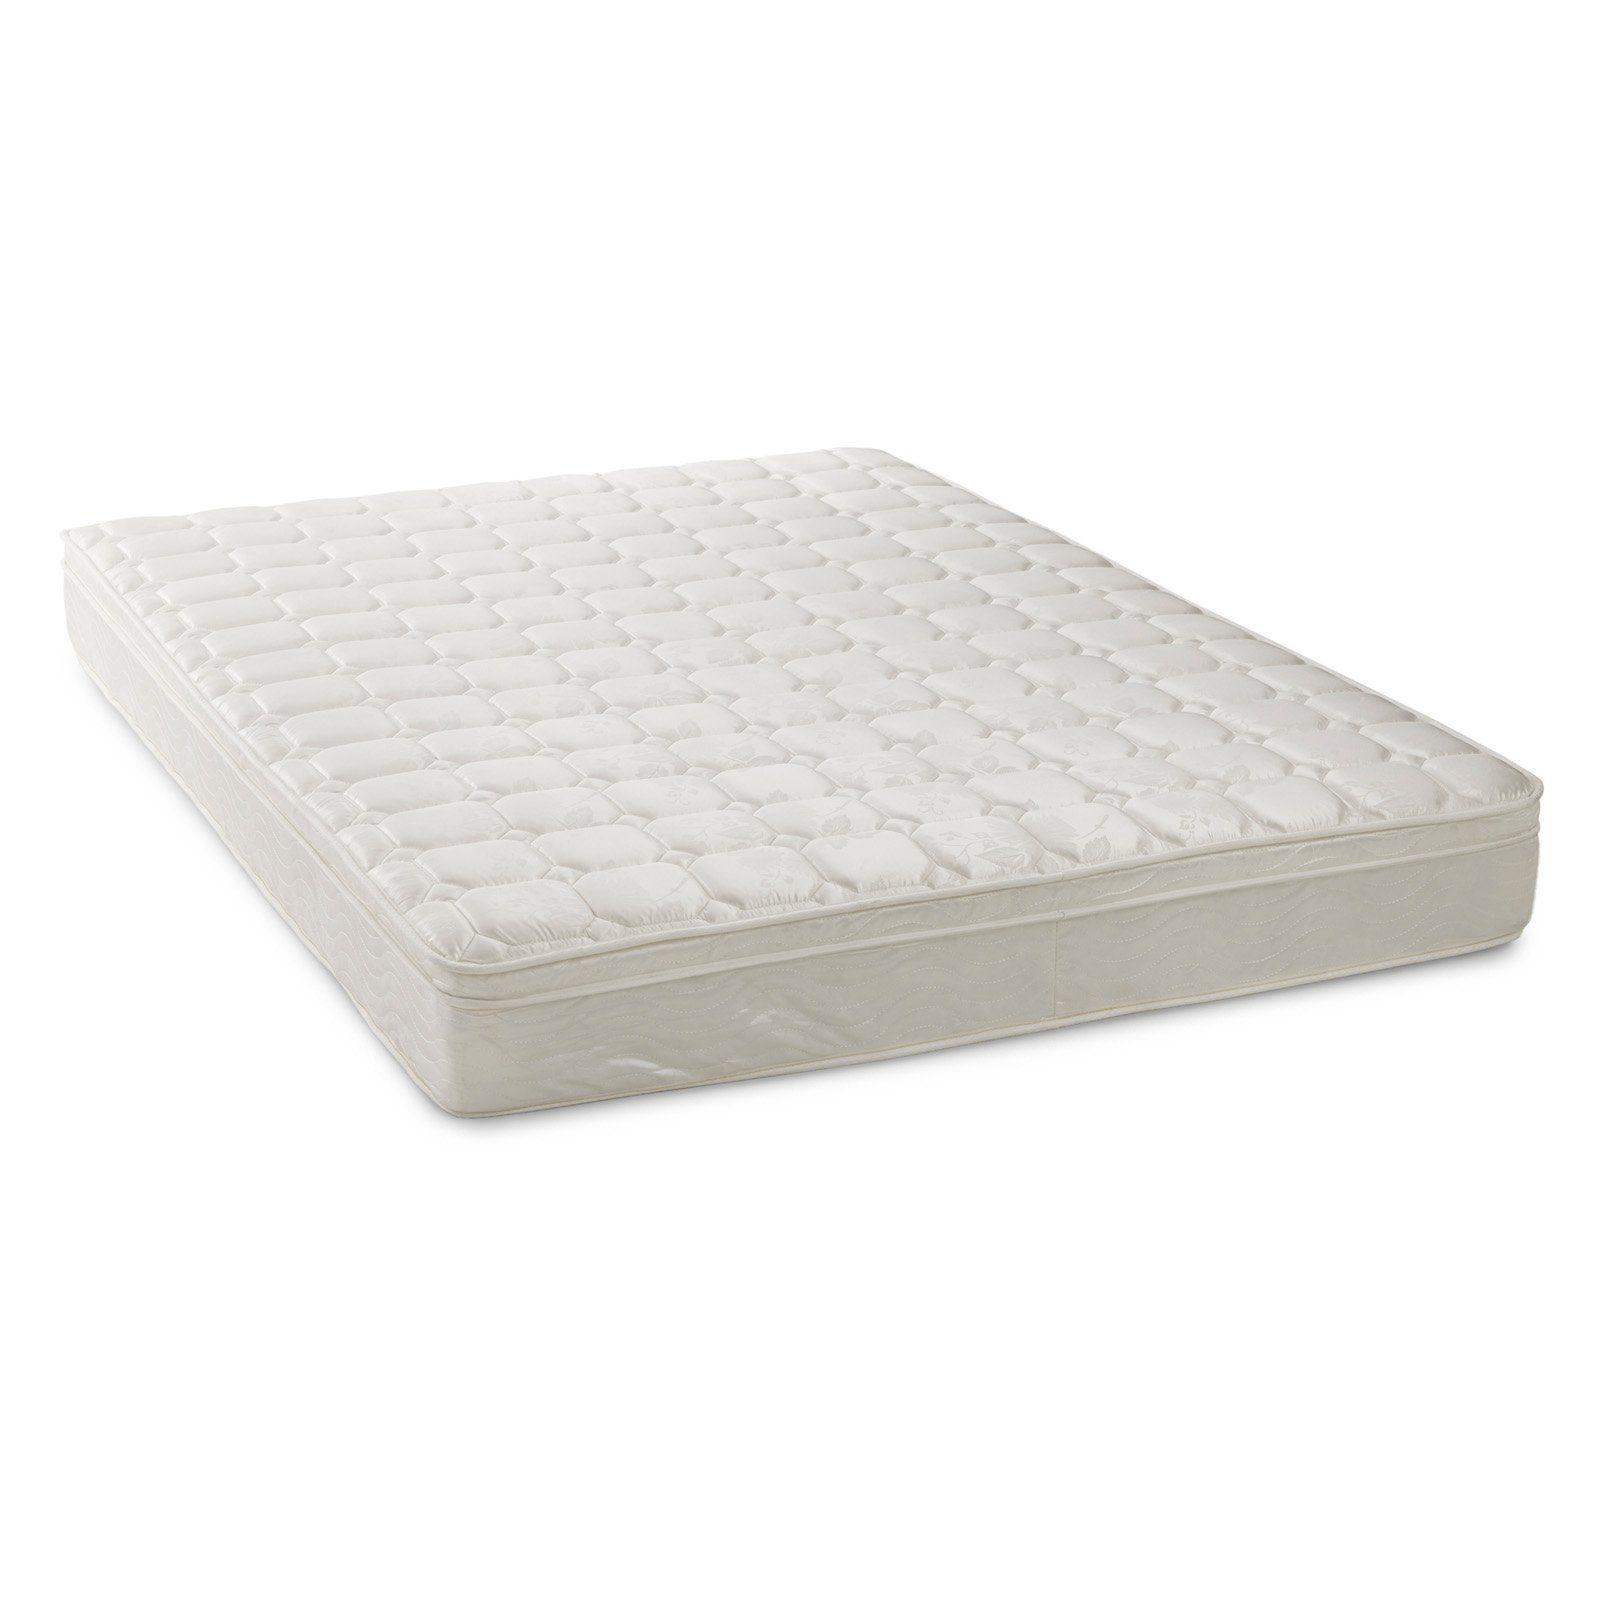 Pillow Top Hybrid Gel Memory Foam